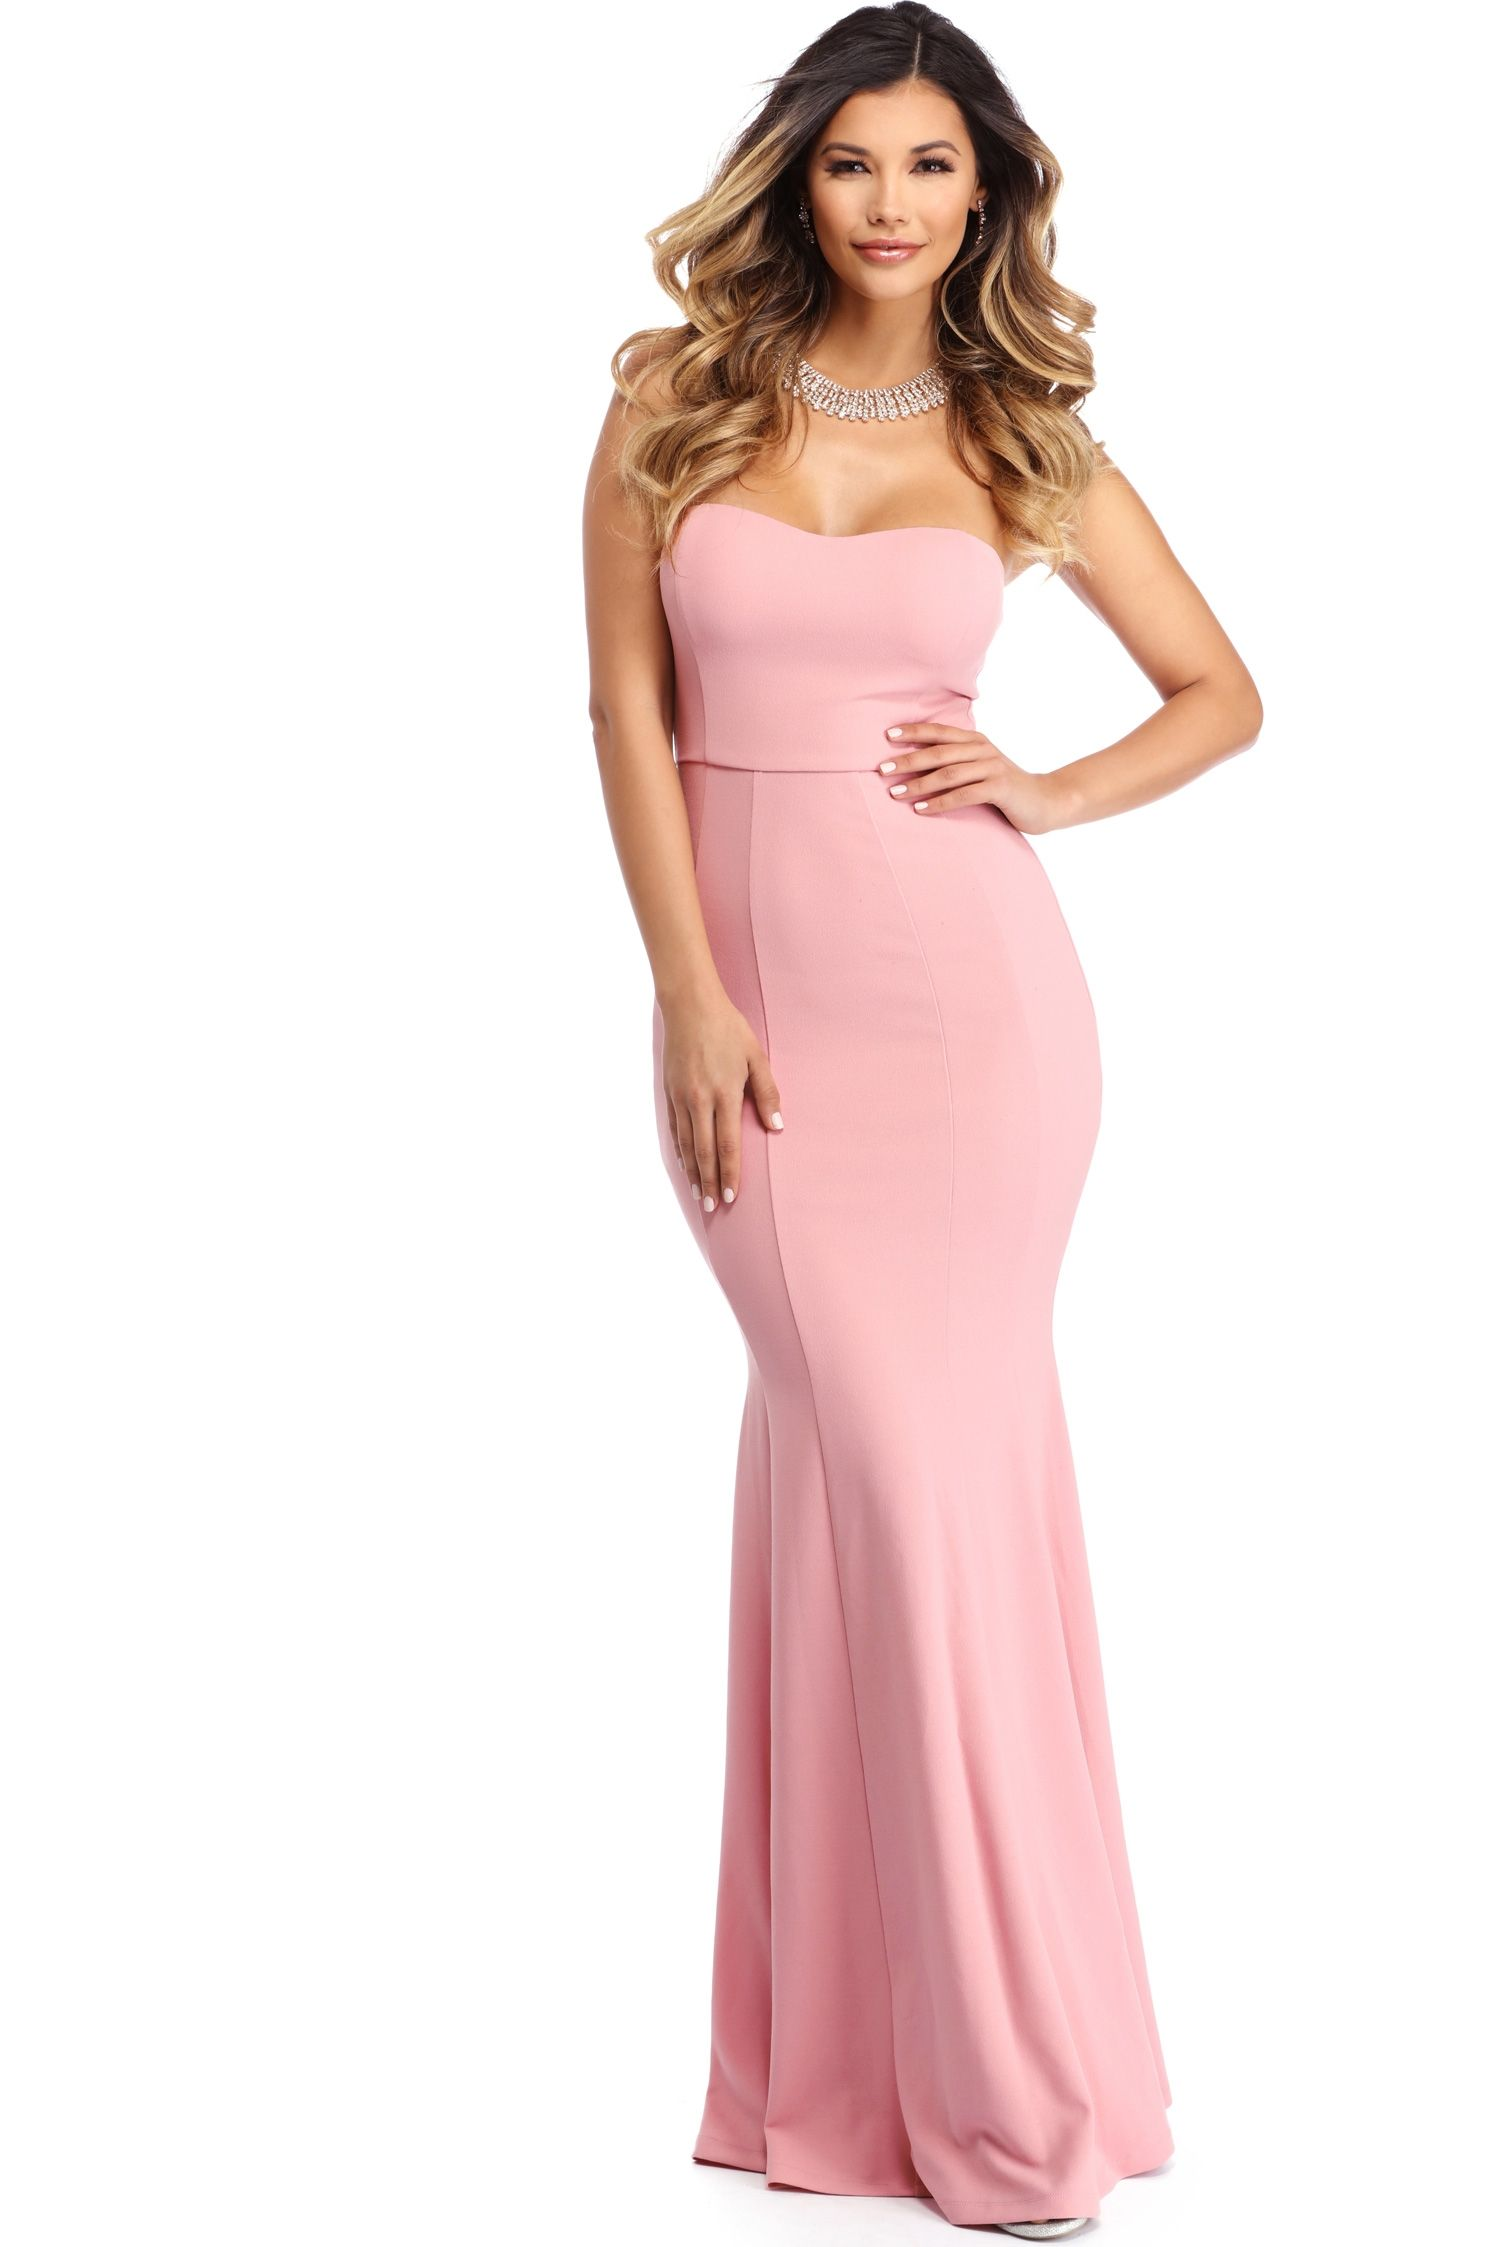 FINAL SALE - Lindsay Pink Sweetheart Trumpet Dress | Trumpet dress ...